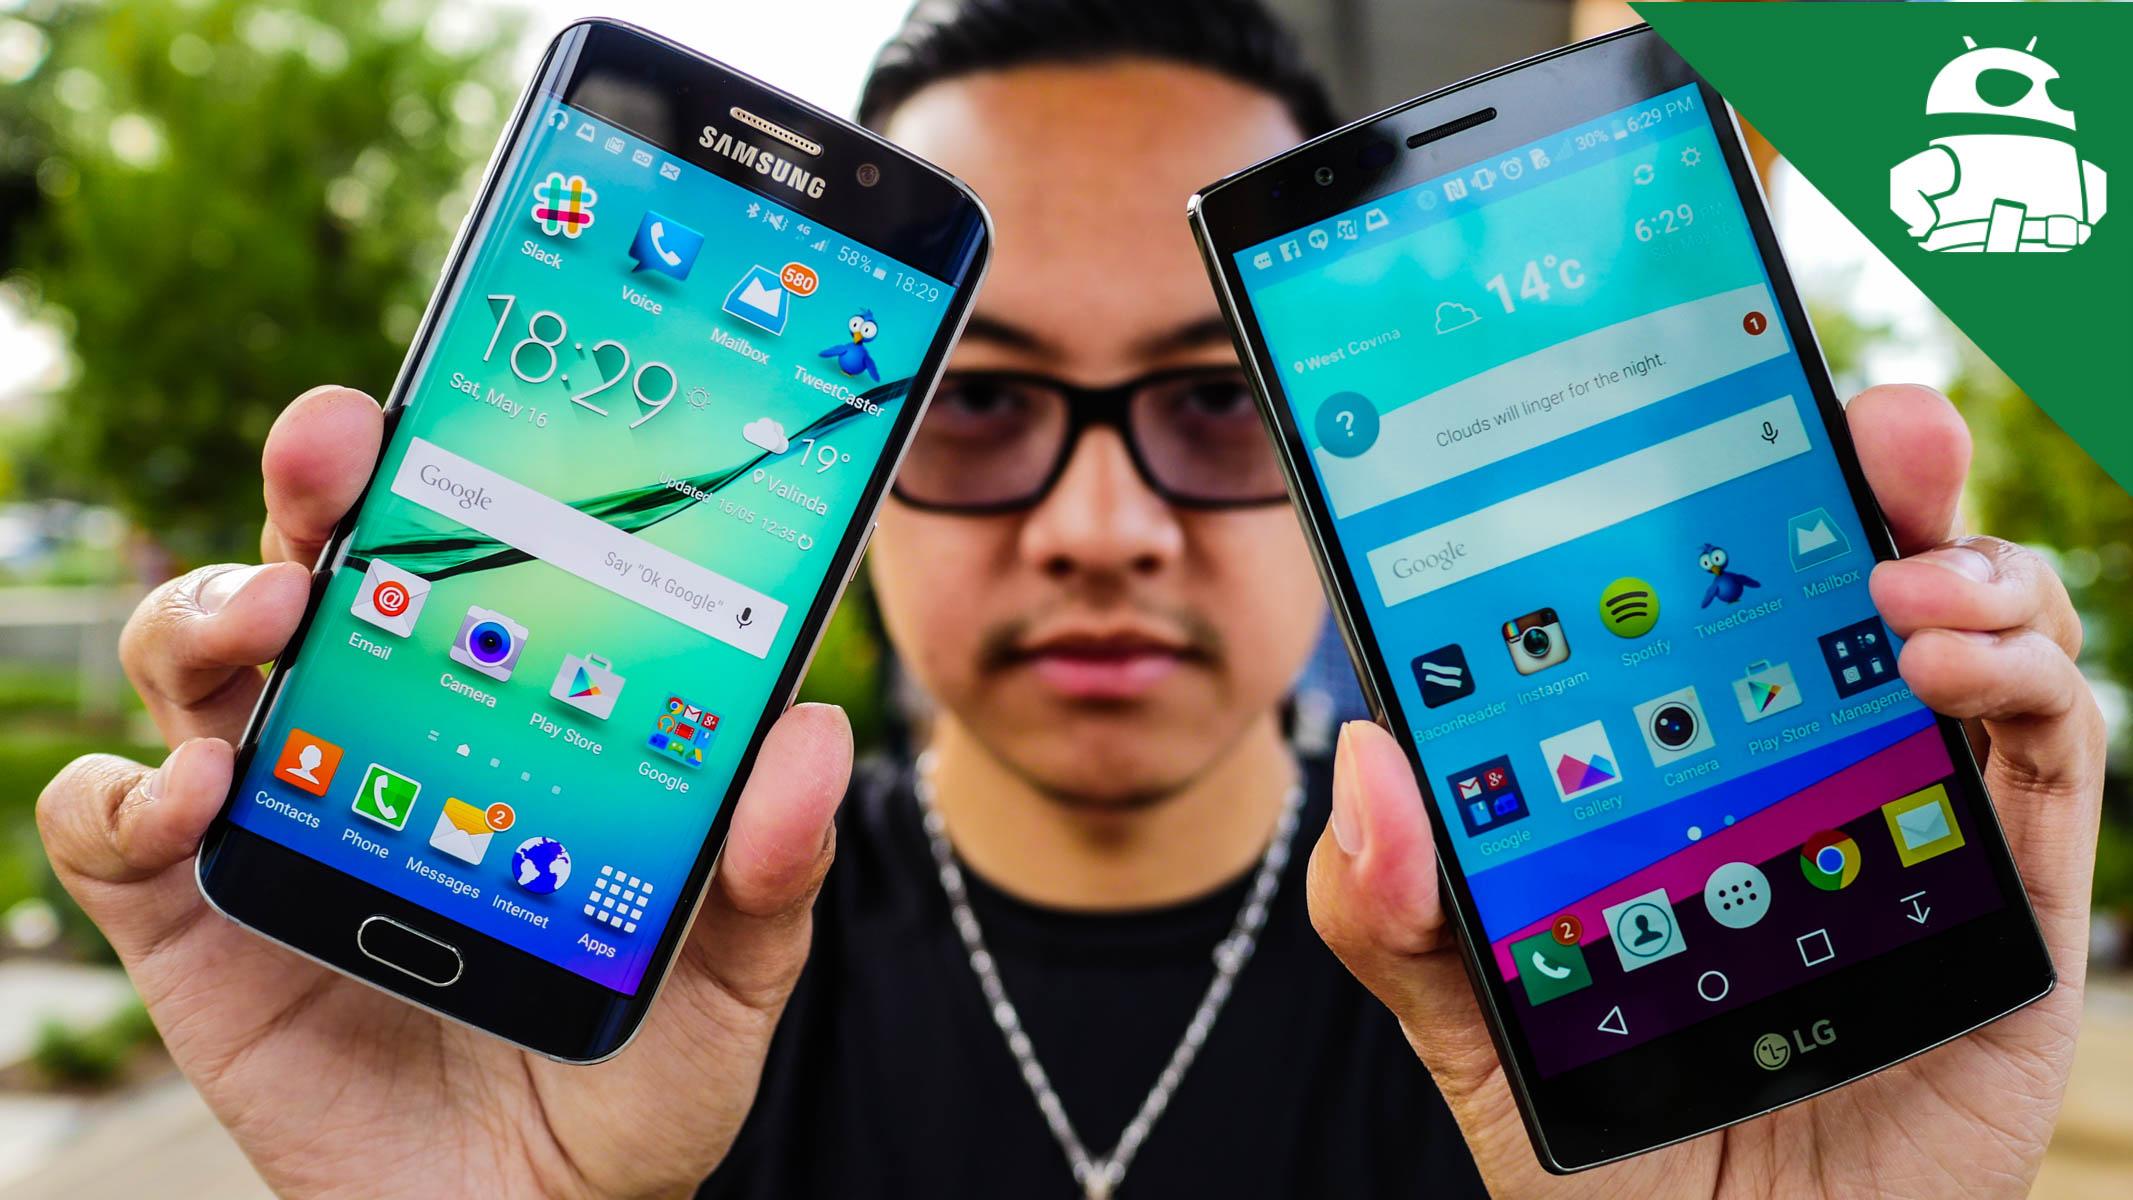 LG G4 vs Samsung Galaxy S6 / S6 Edge